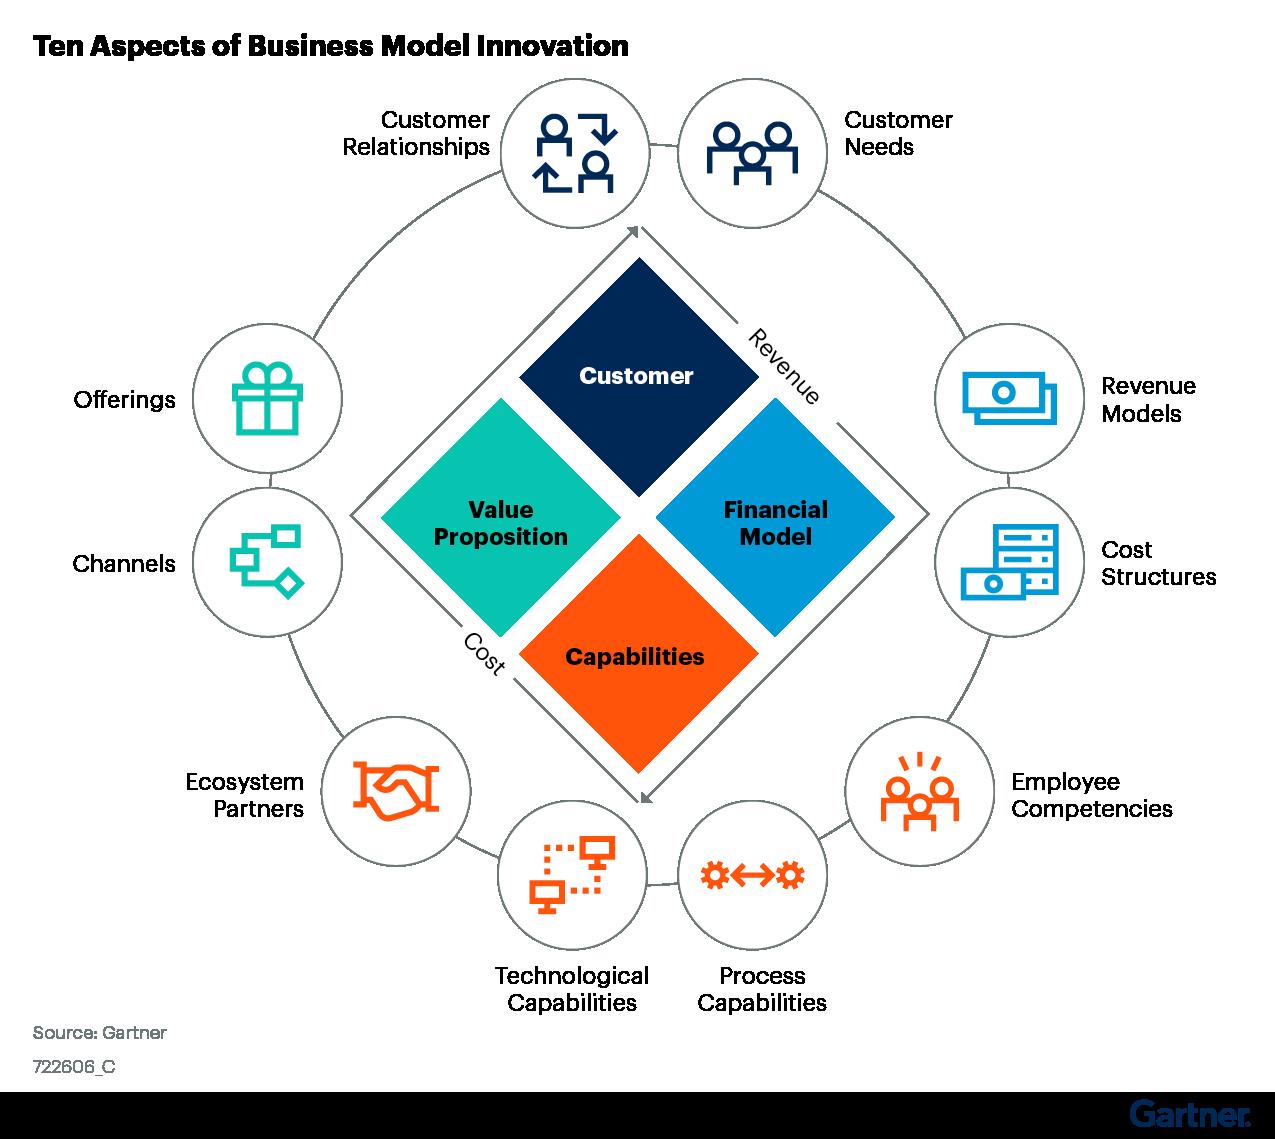 Figure 1: Ten Aspects of Business Model Innovation